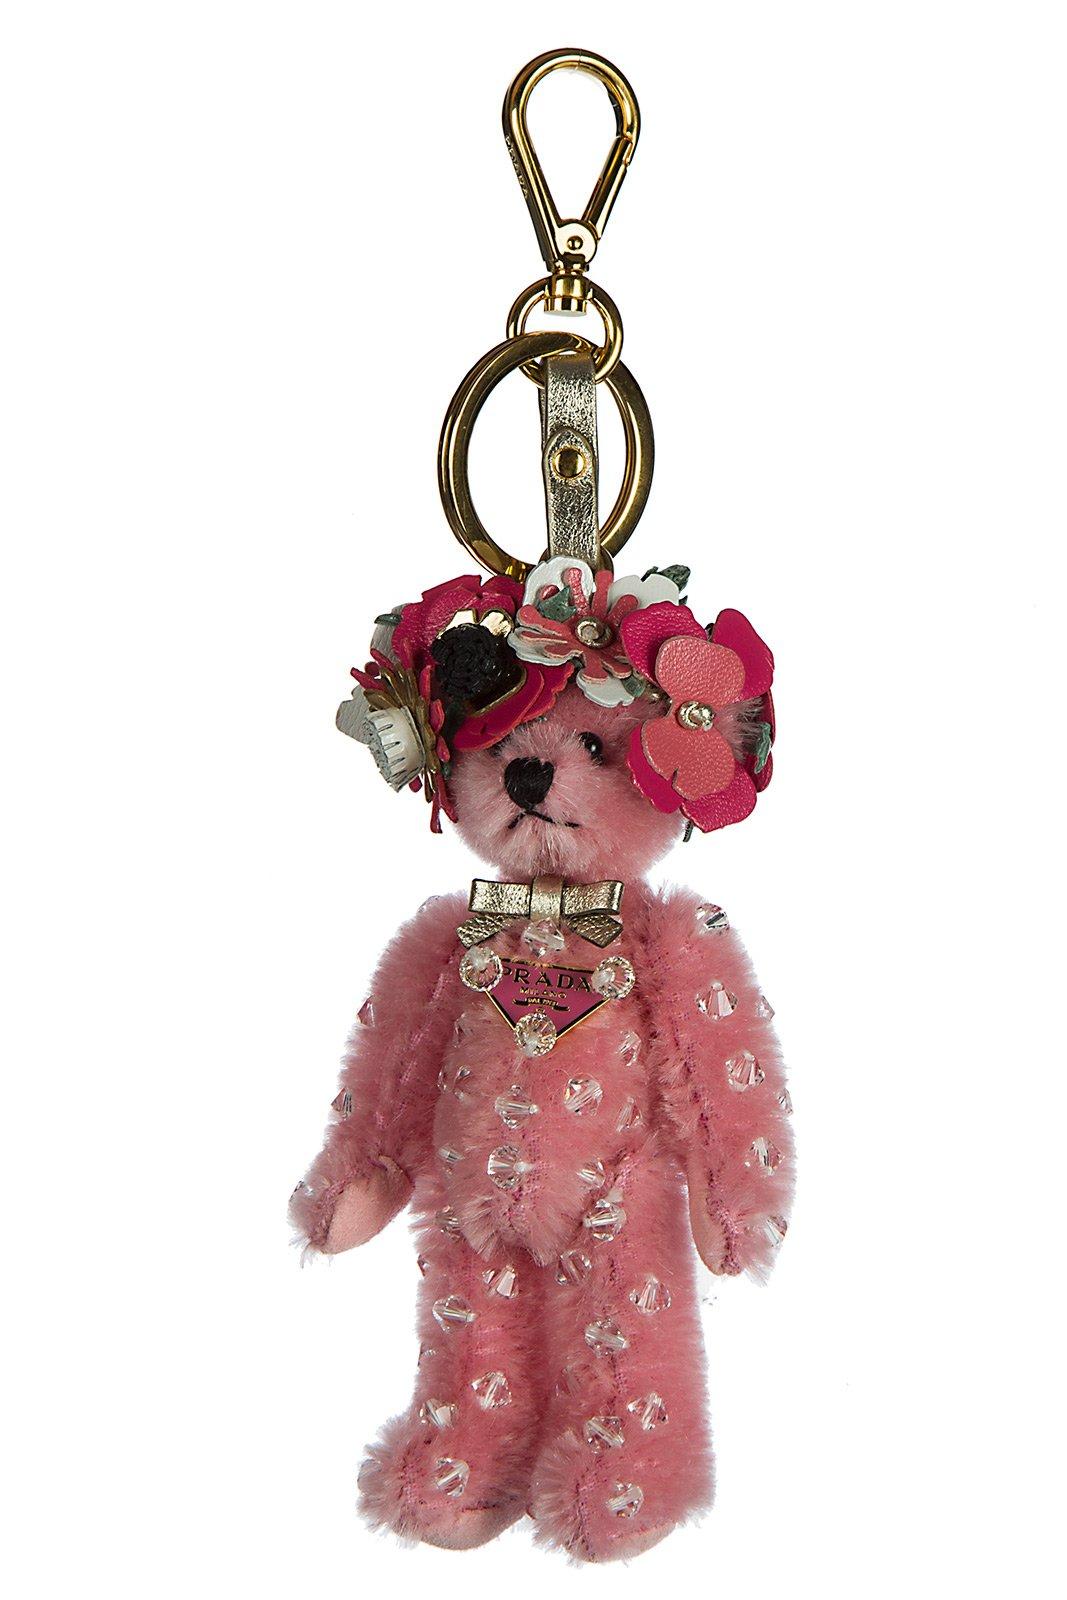 Prada women's keychain keyring trick orsetto enea pink